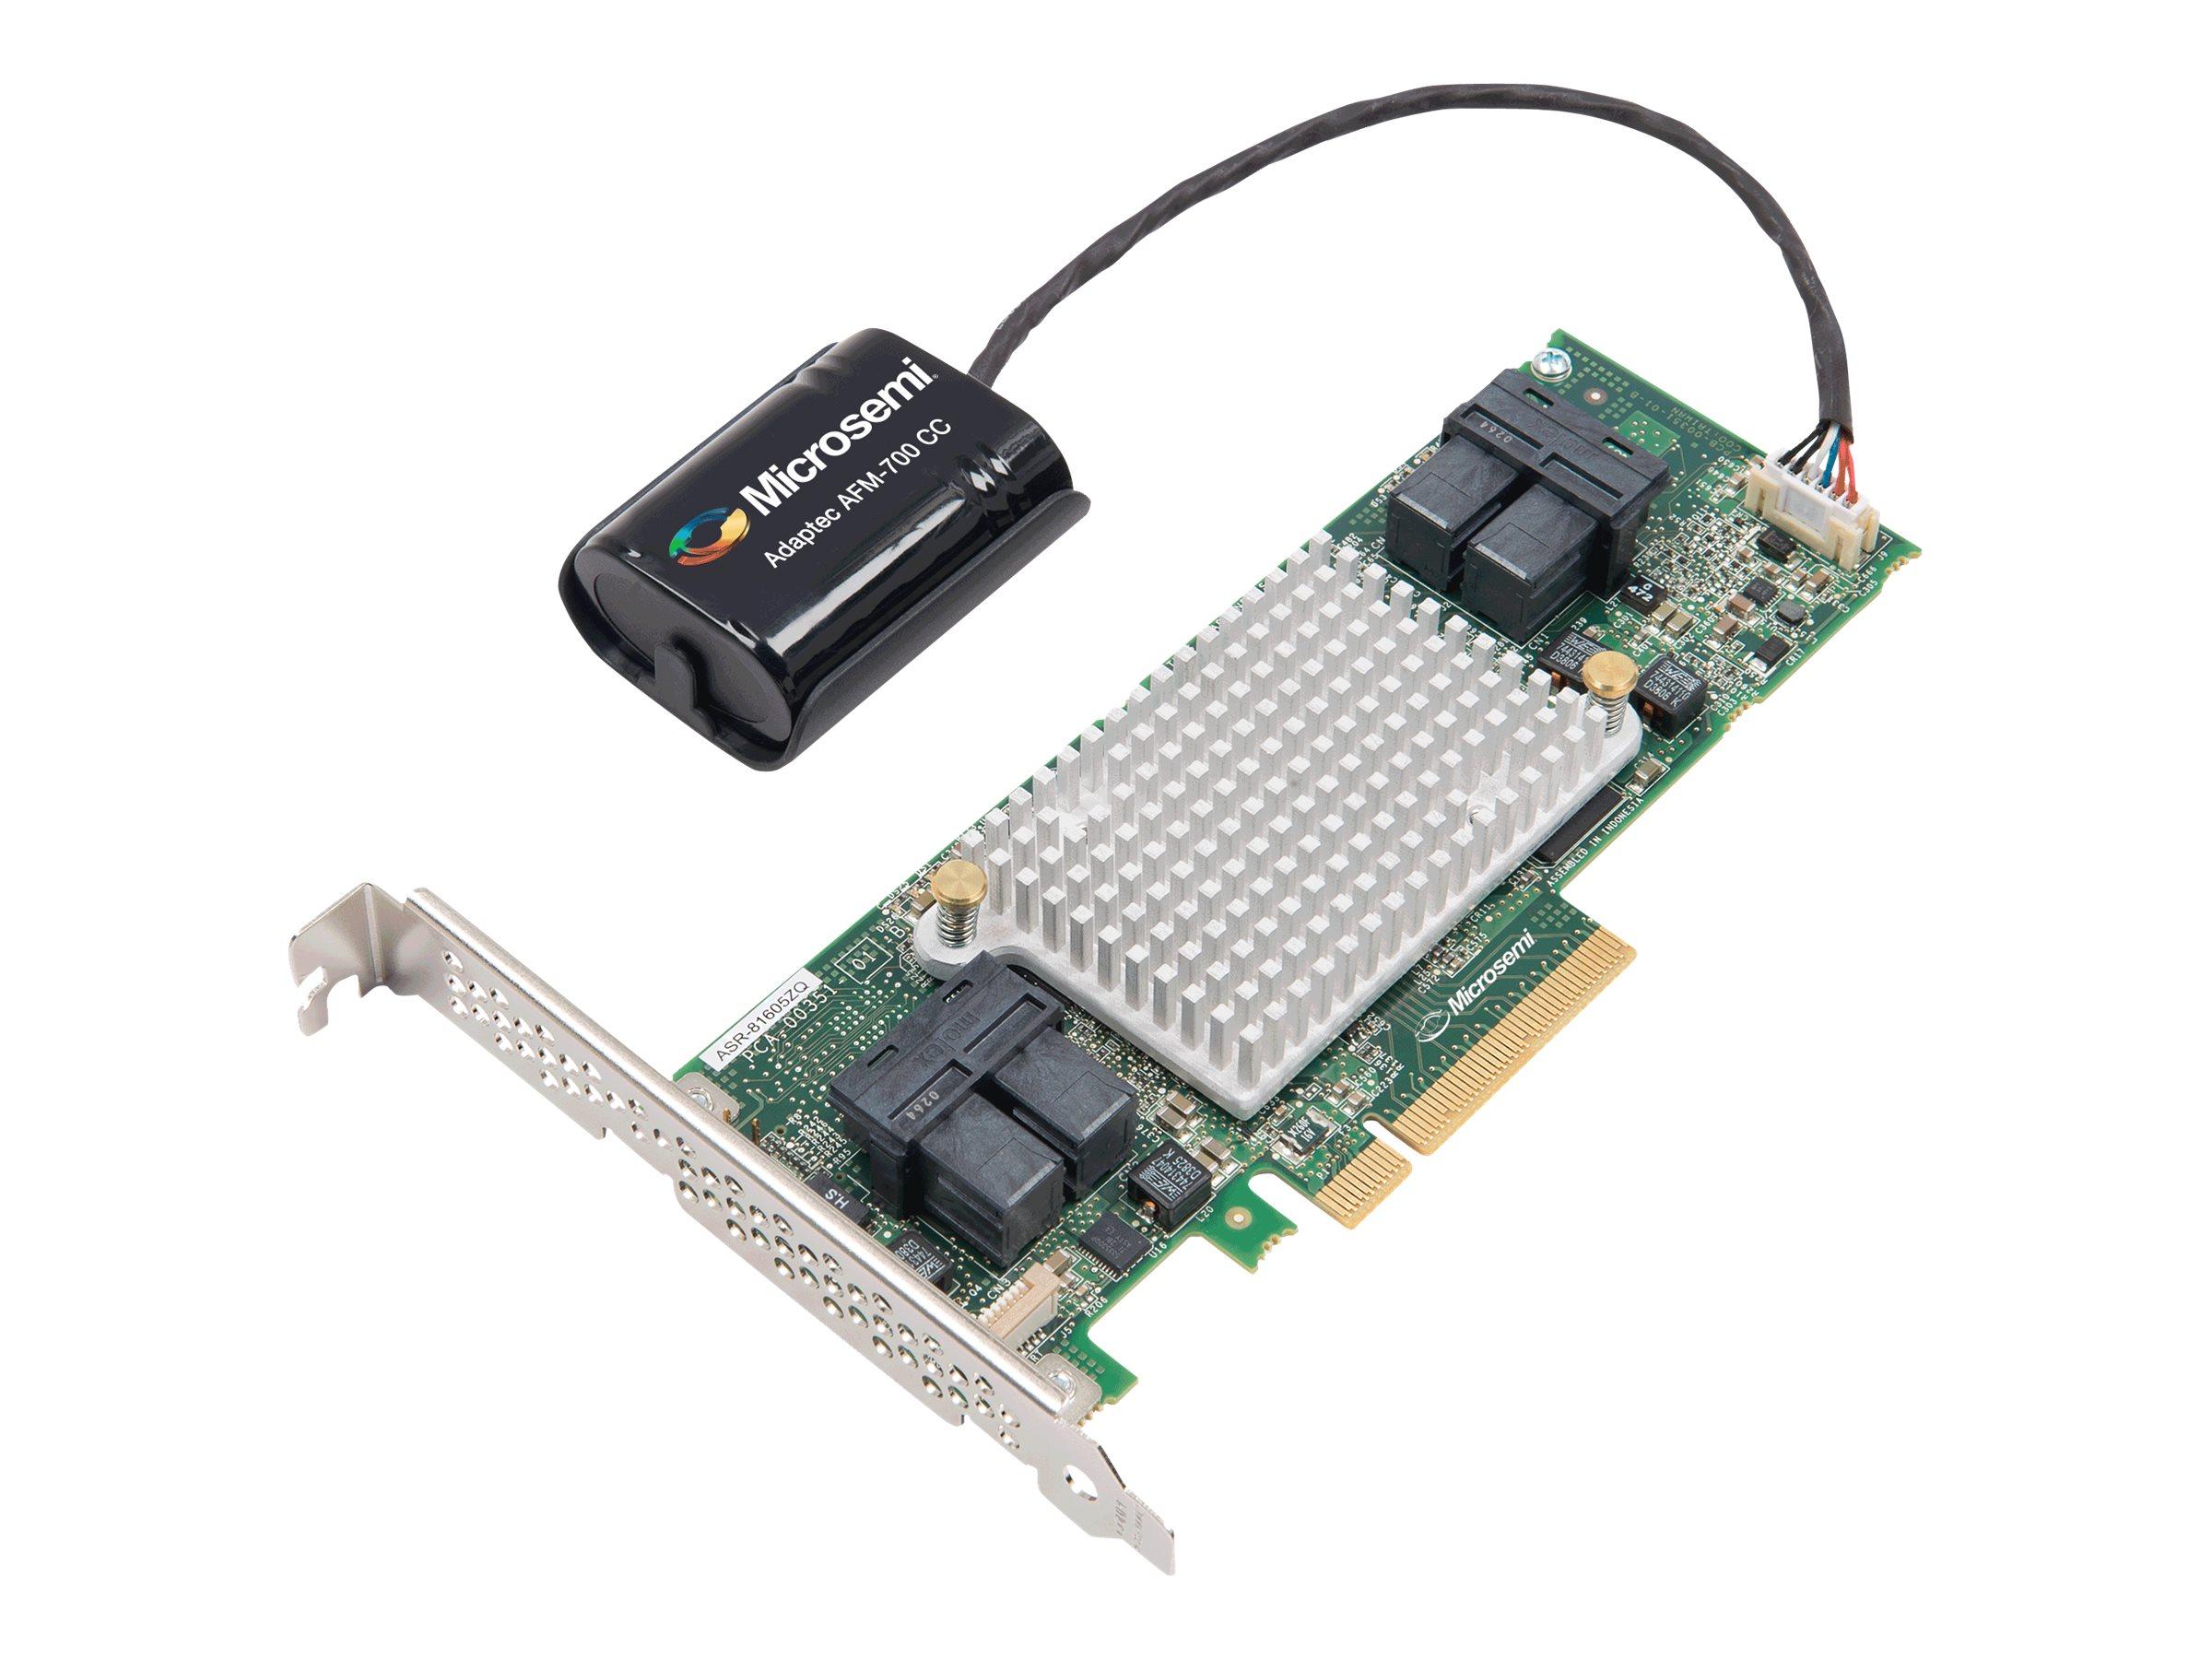 Microsemi Adaptec 81605ZQ - Speichercontroller (RAID) - 16 Sender/Kanal - SATA 6Gb/s / SAS 12Gb/s Low-Profile - 12 Gbit/s - RAID